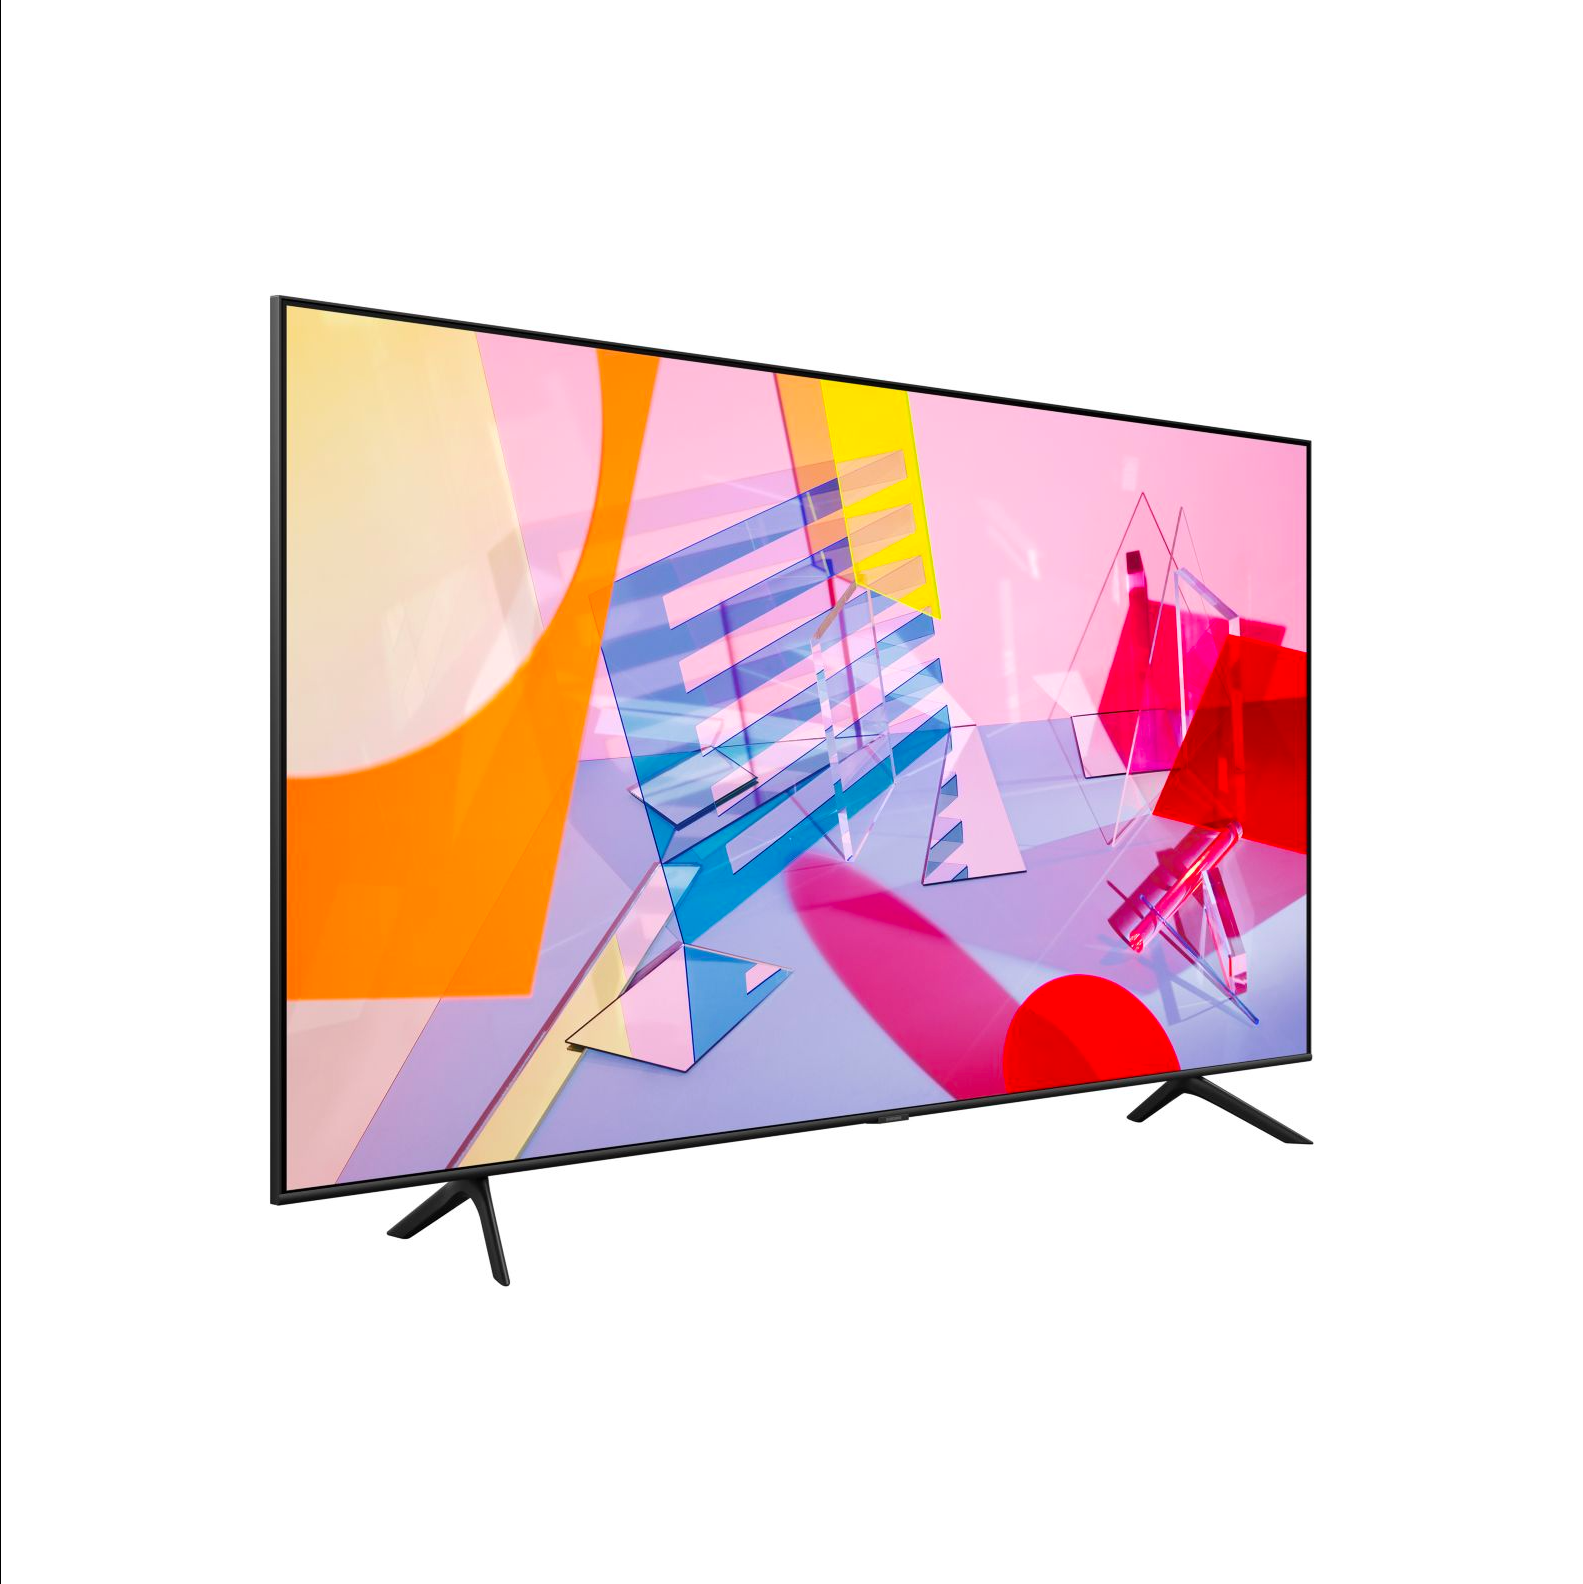 TV SAMSUNG QLED QE55Q60T- image 3